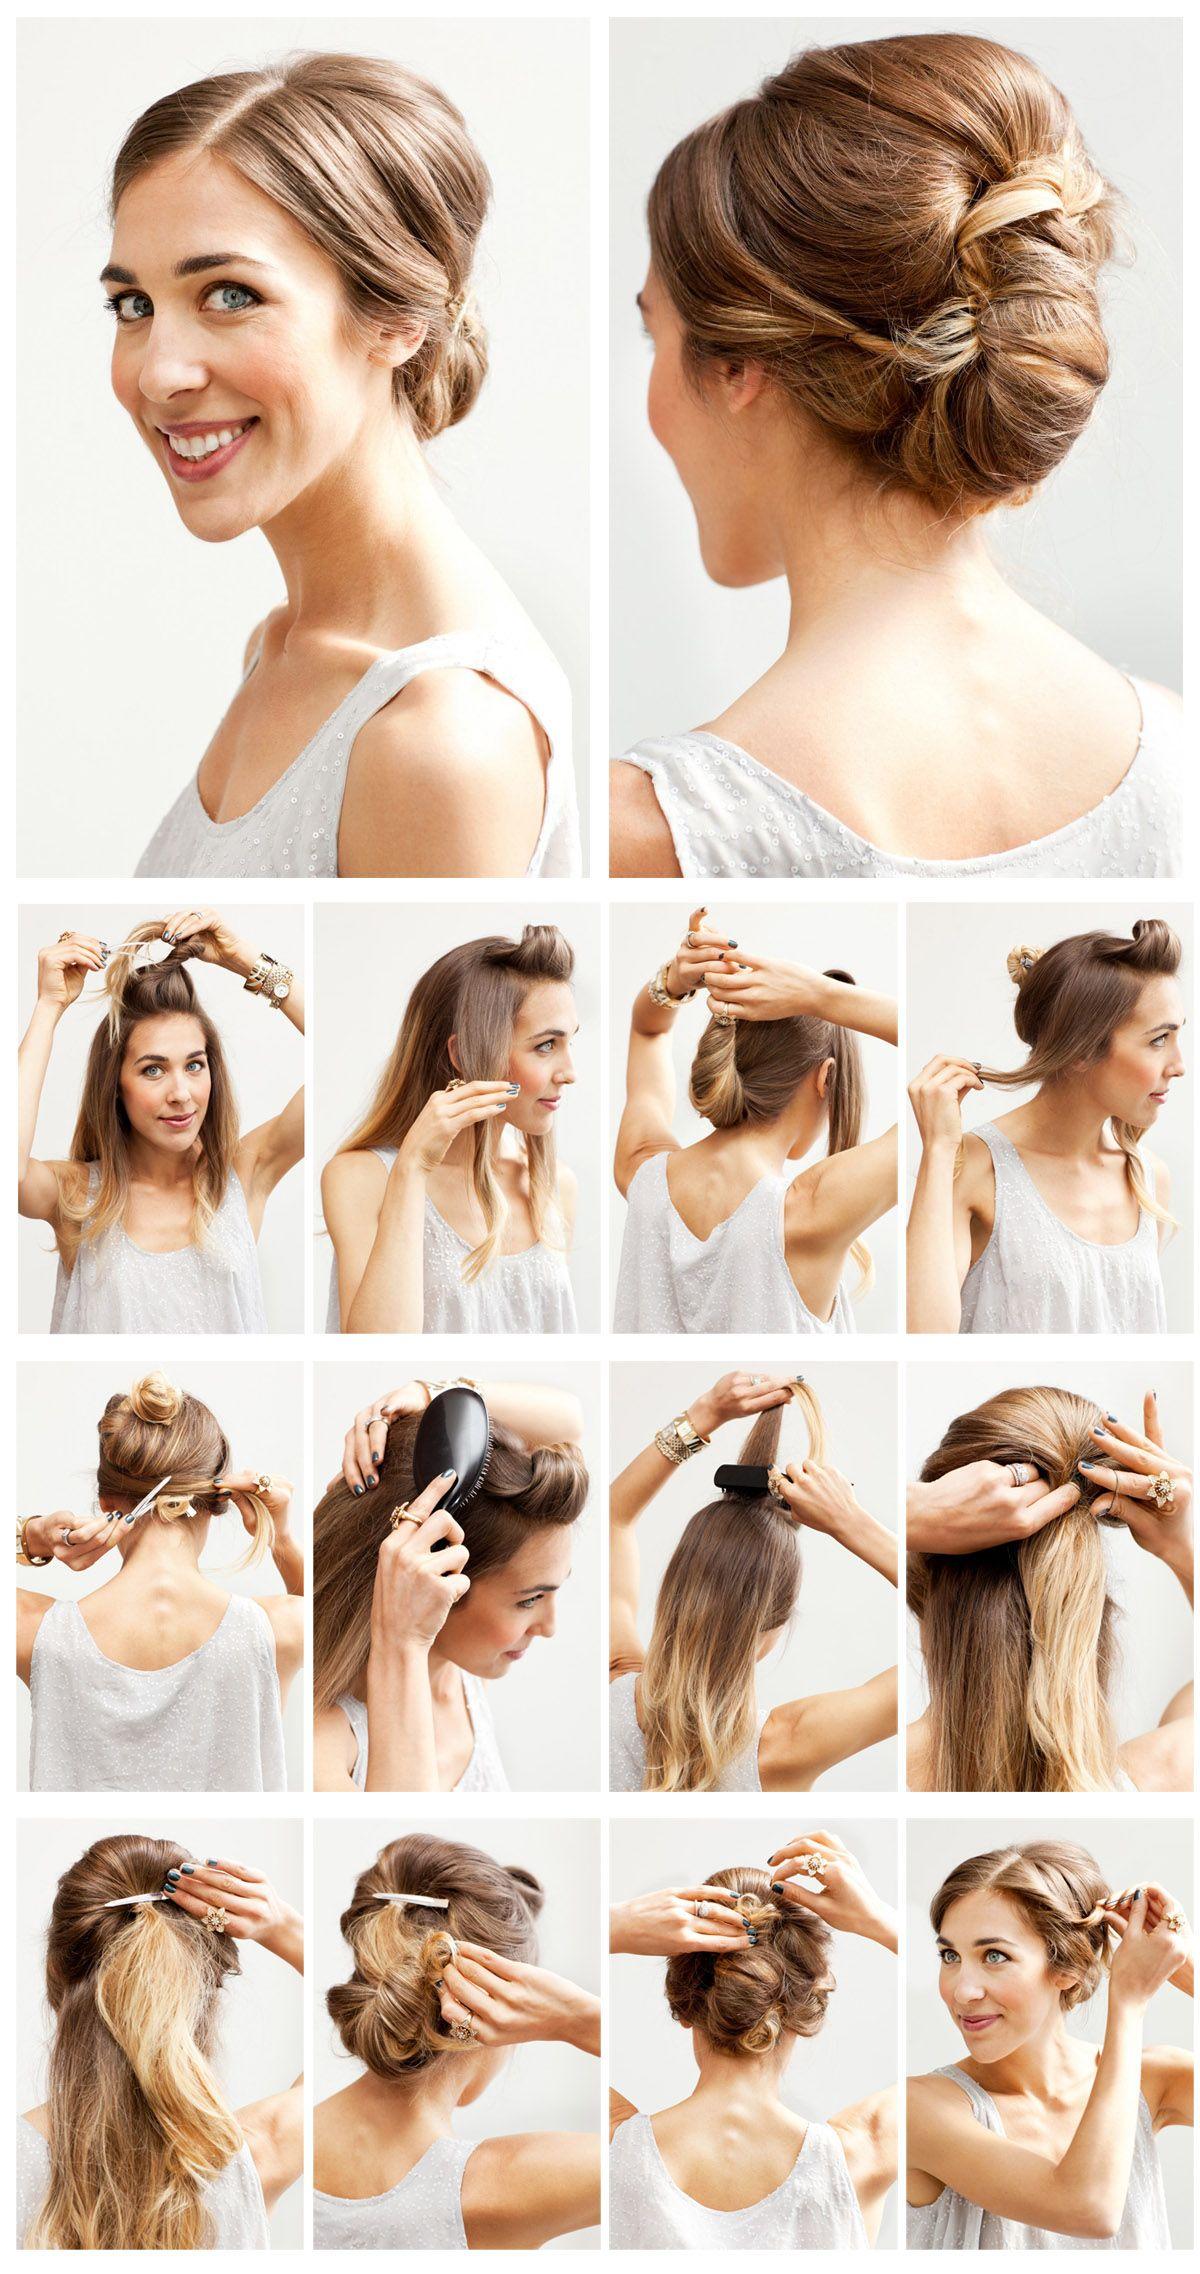 12 Hottest Wedding Hairstyles Tutorials For Brides And Bridesmaids Popular Haircuts Medium Hair Styles Medium Length Hair Styles Shoulder Hair